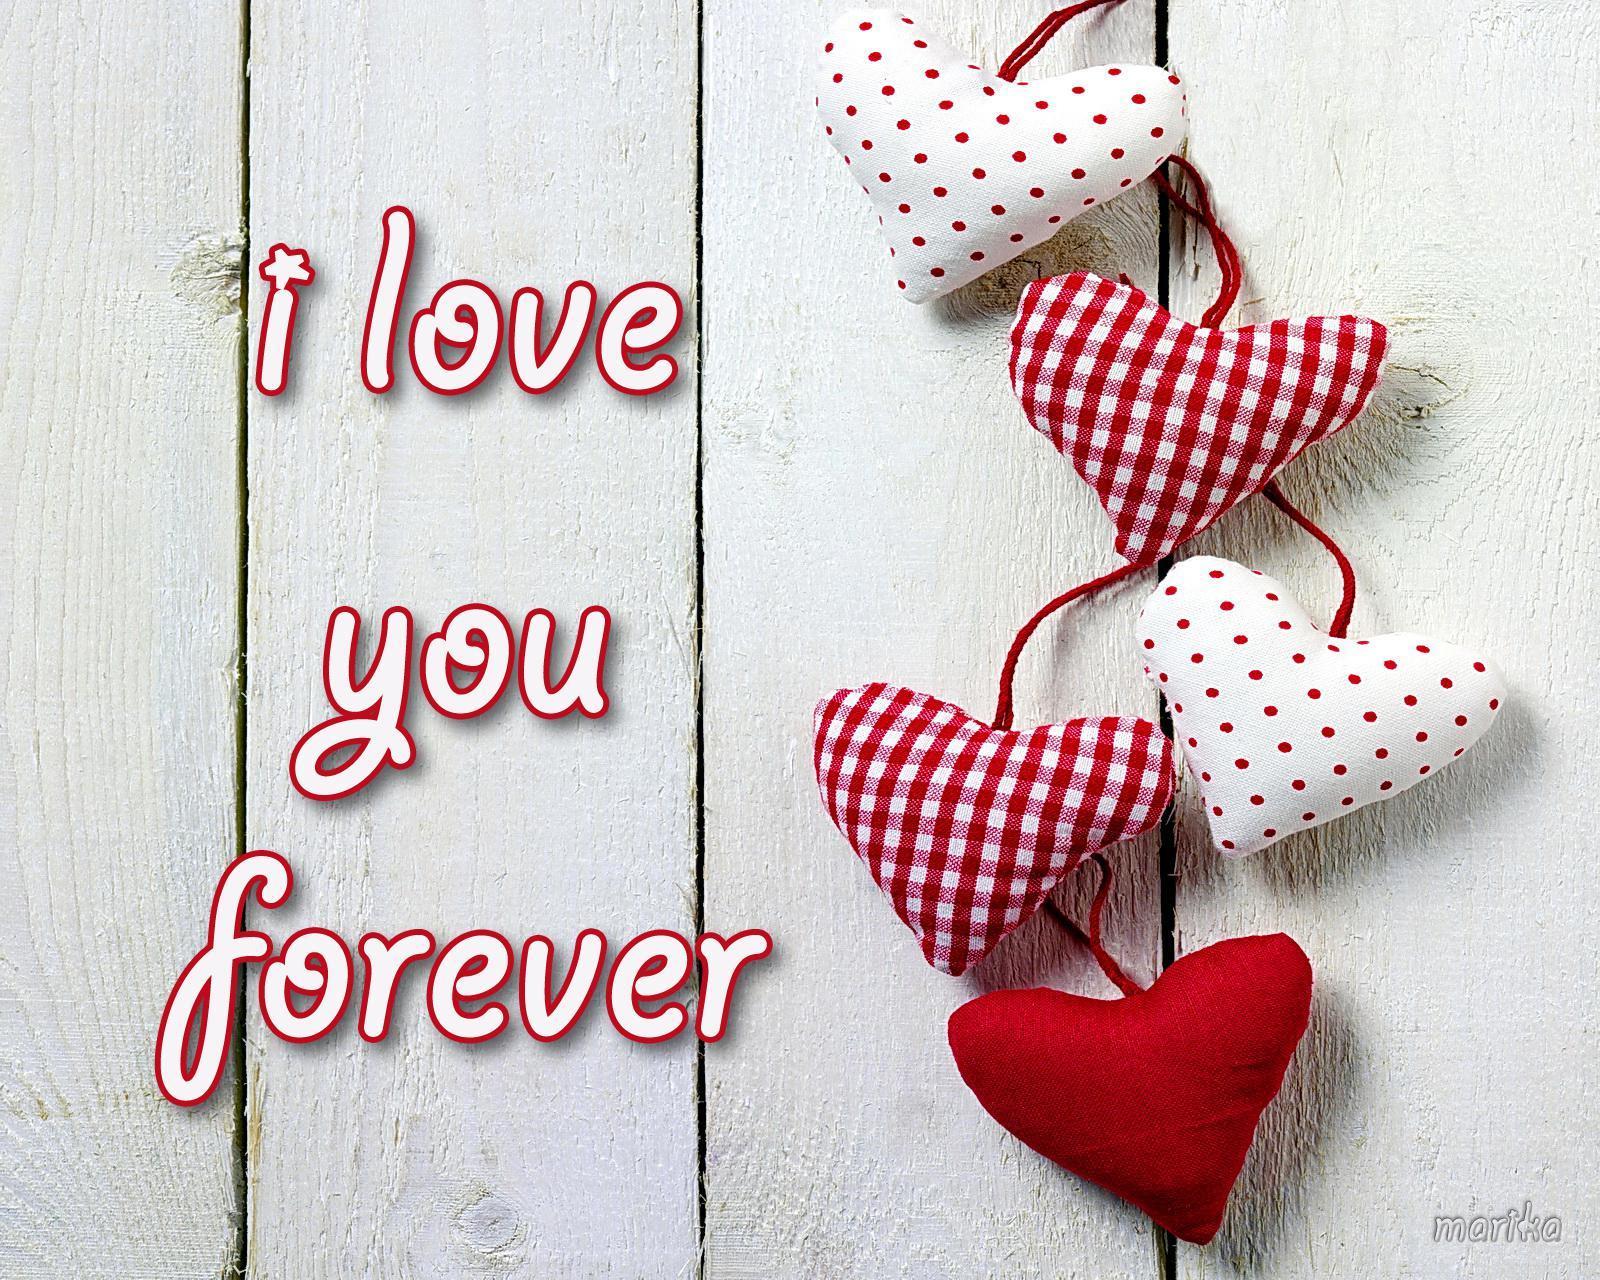 I Love U Wallpaper - BDFjade